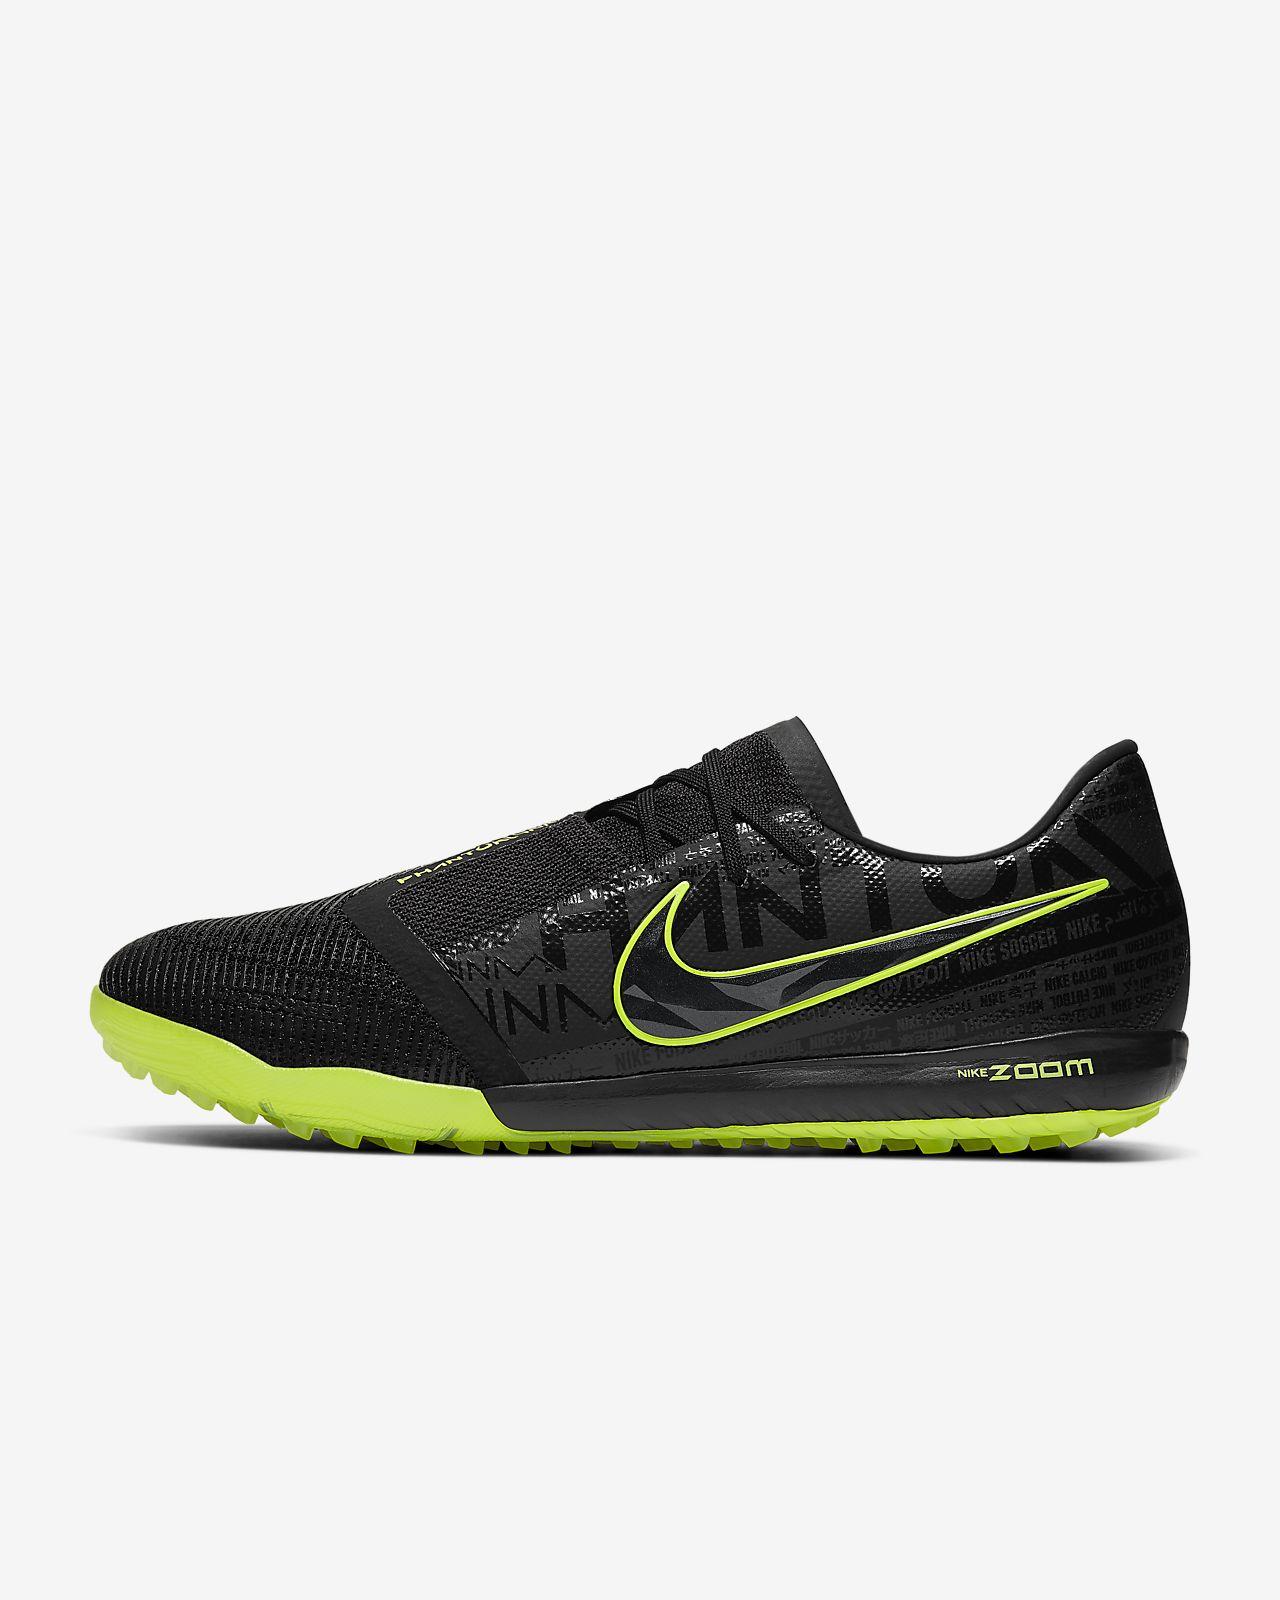 Nike Zoom Phantom Venom Pro TF Botas de fútbol para hierba artificial o moqueta - Turf